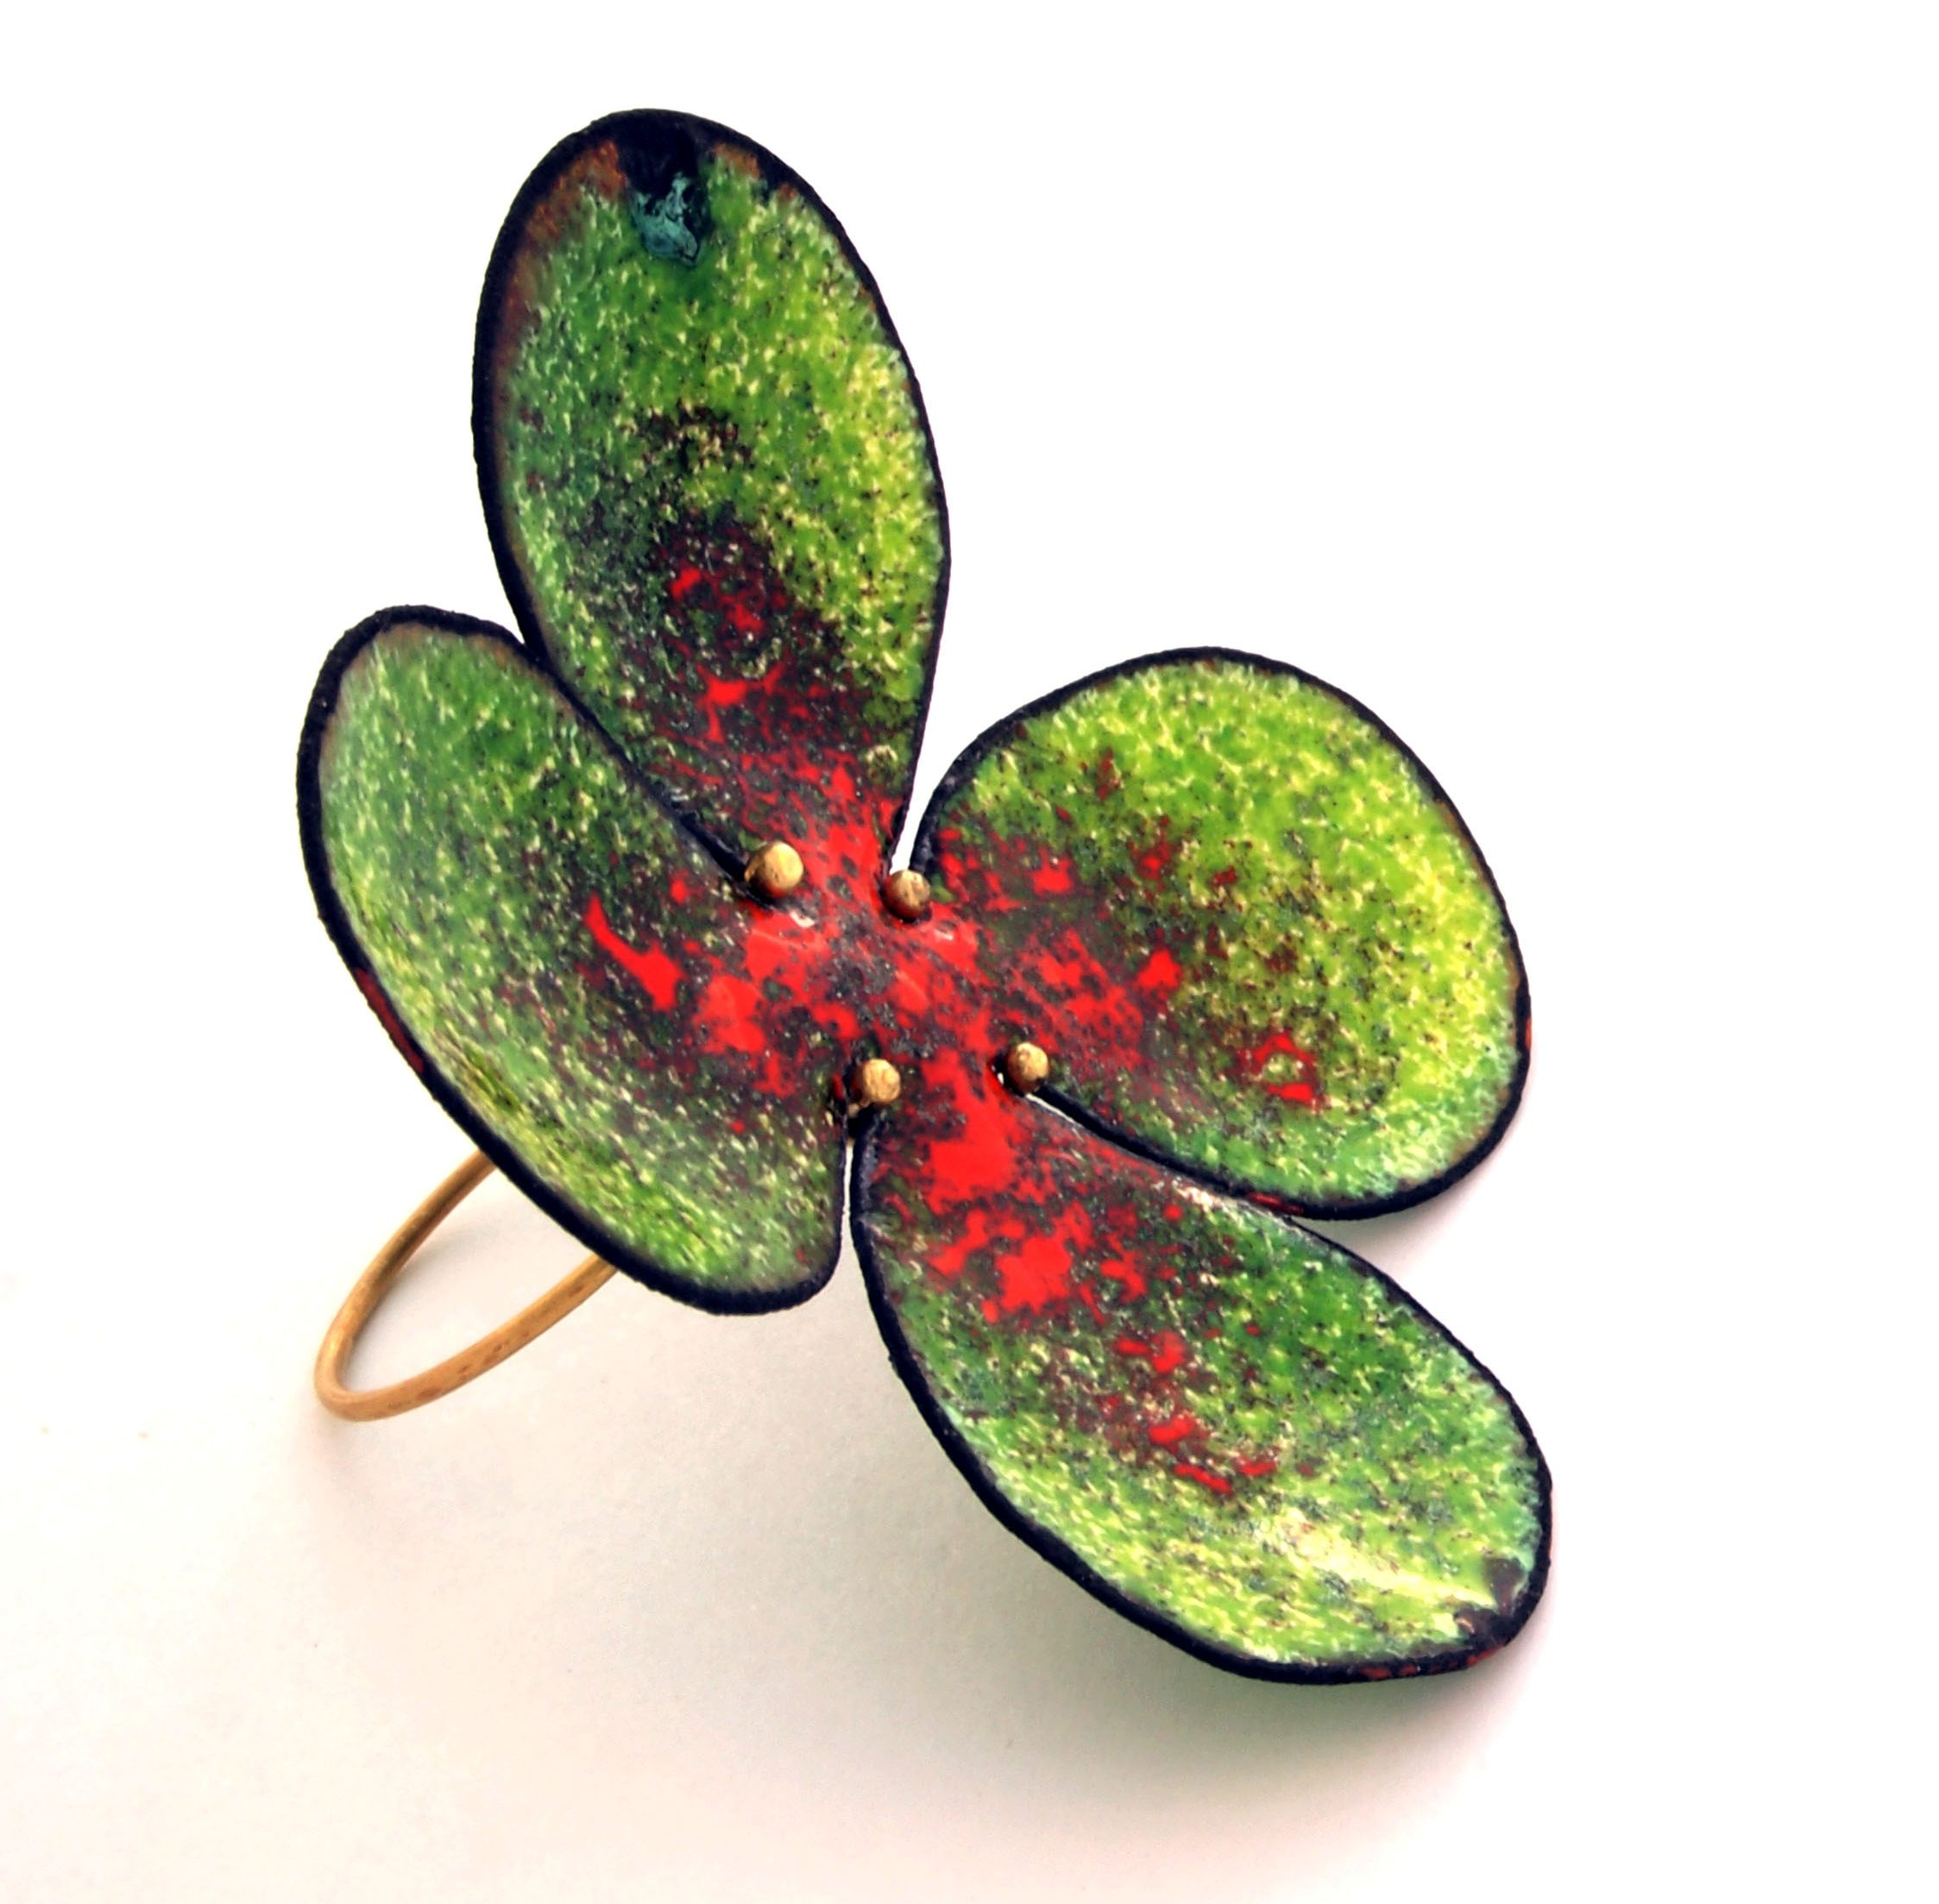 Francesca di Ciaula, Red Spot on Green, ring, 2013. Foto met dank aan Francesca di Ciaula©